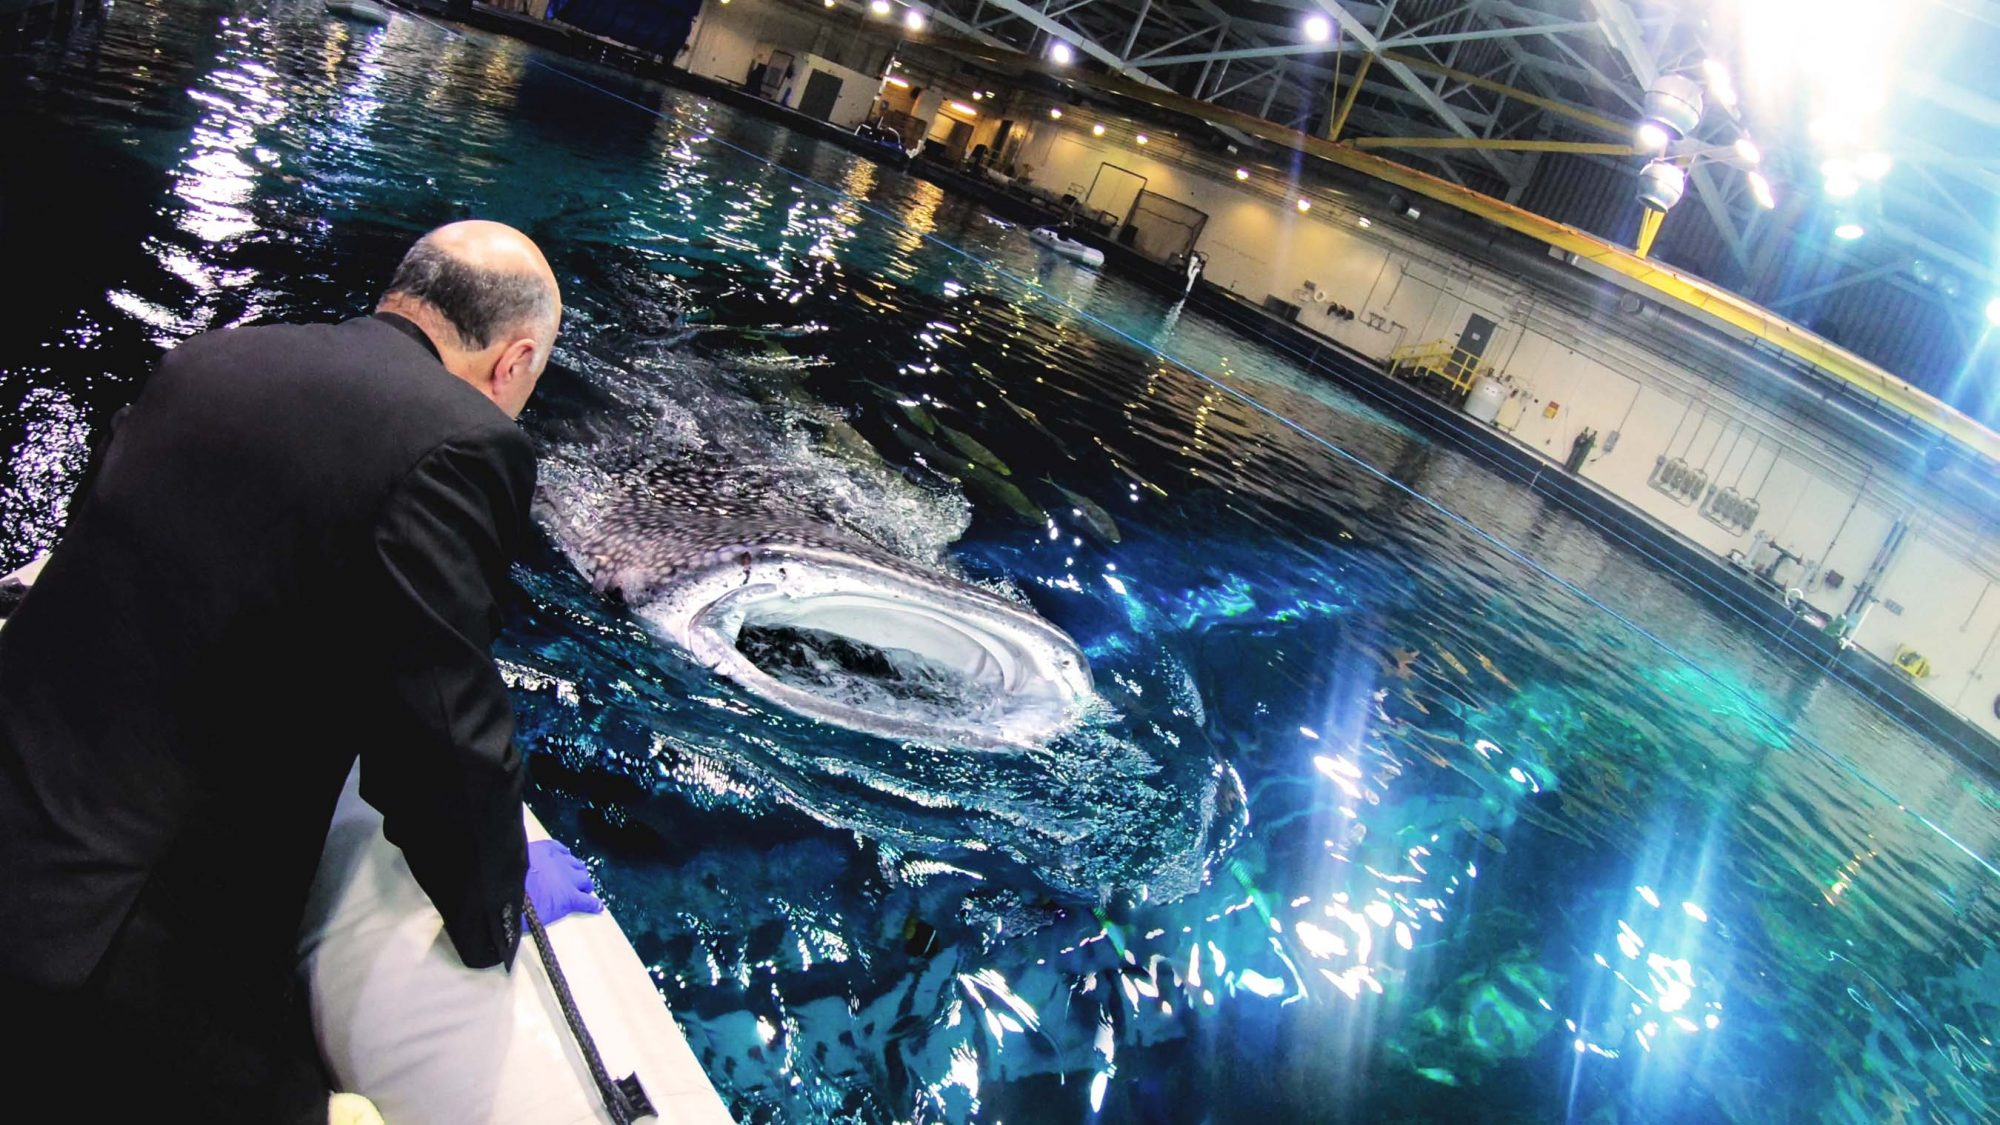 Kevin O'Leary Shark Tank Meets Shark Week